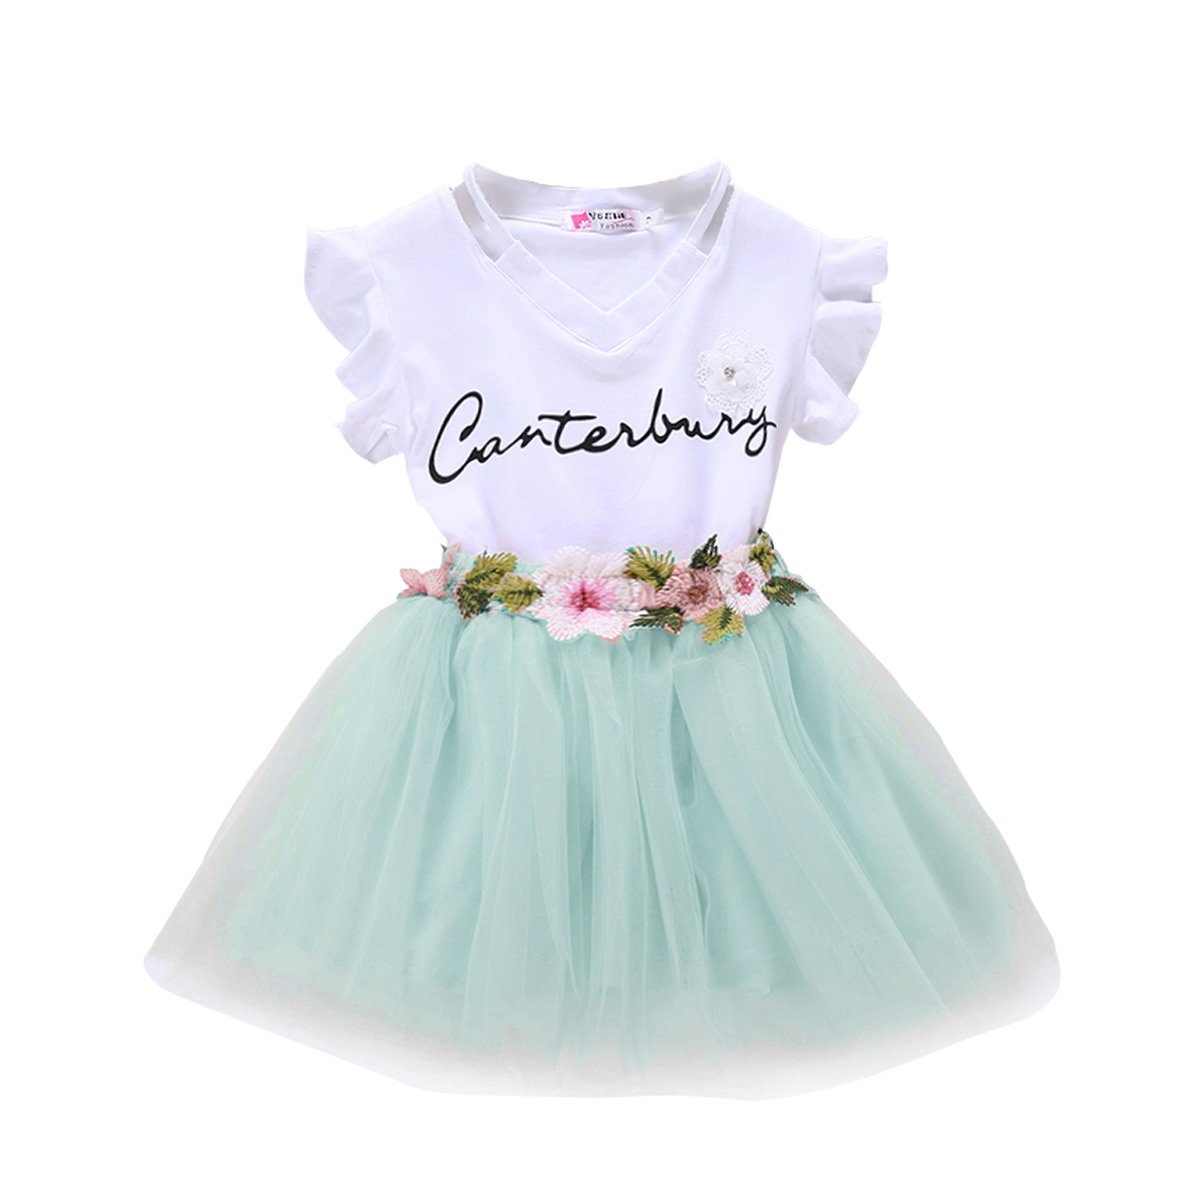 80b5fd8c3210 Top 10 wholesale Short Sleeve Gauze Dress - Chinabrands.com